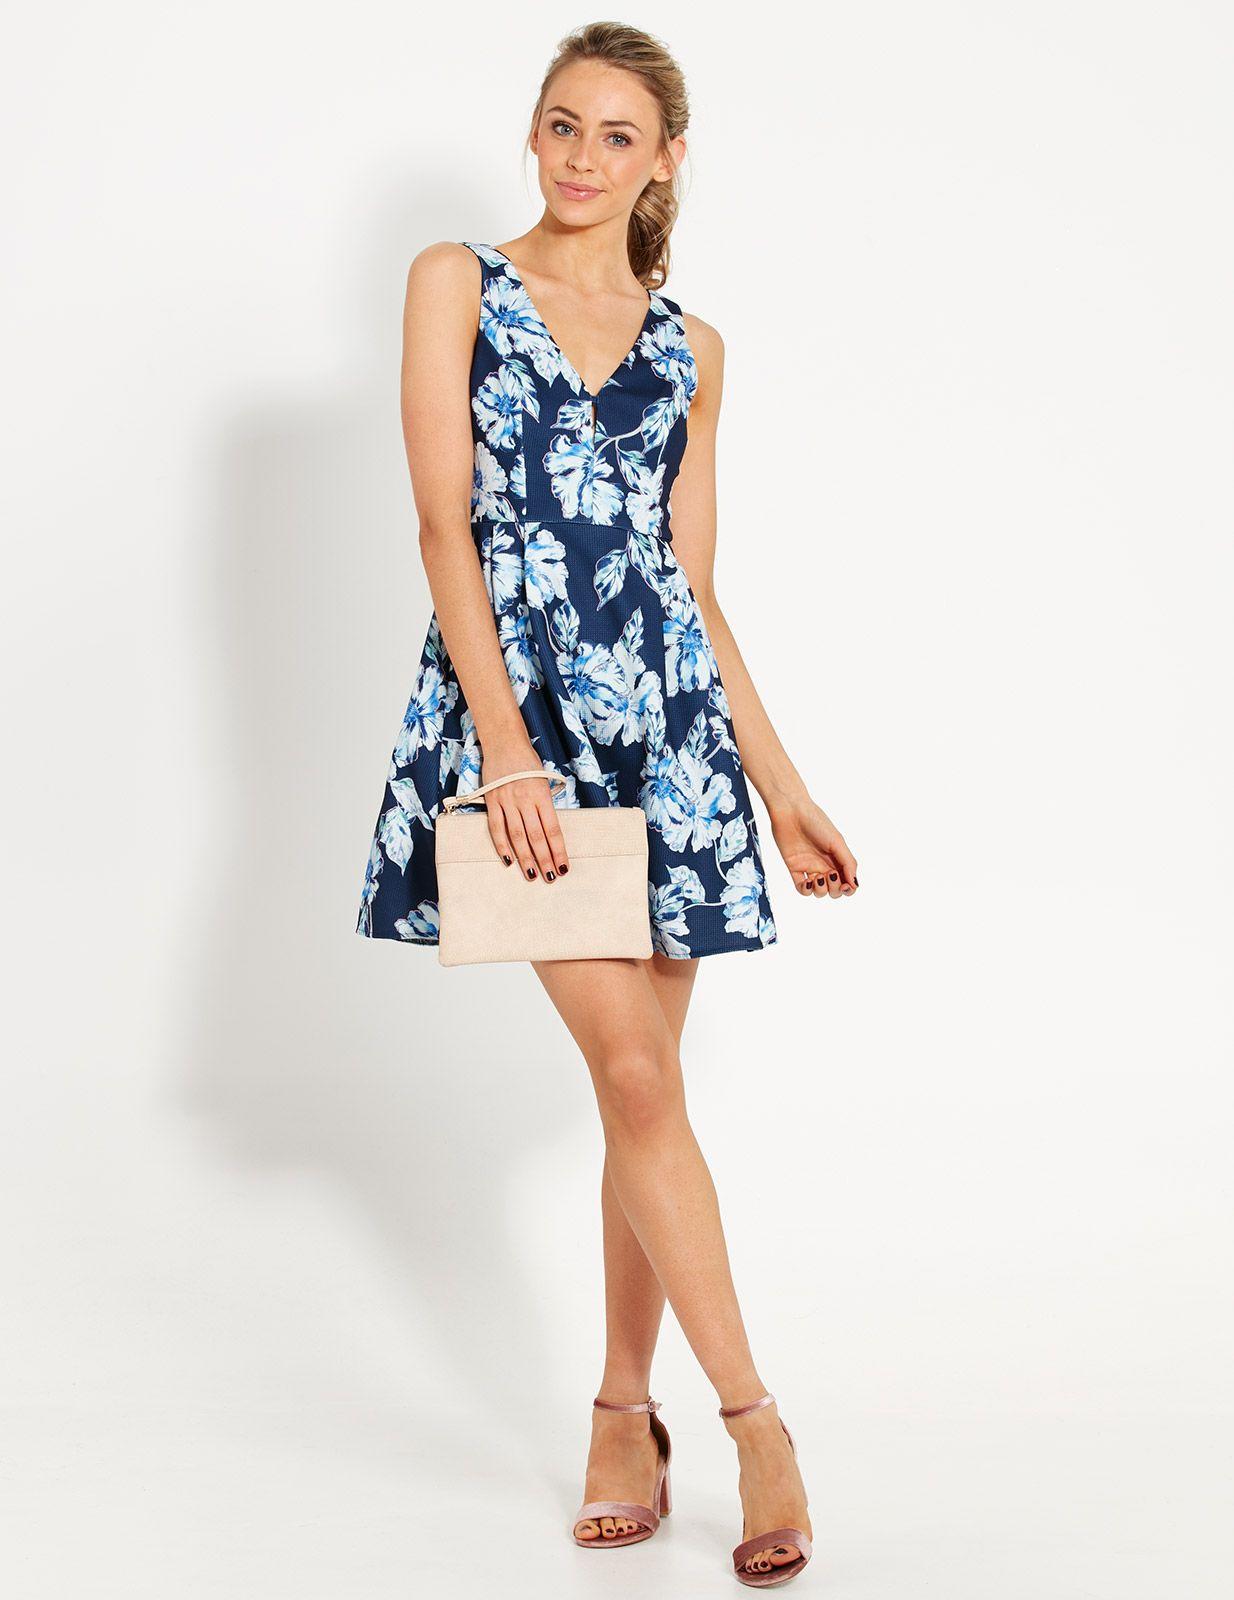 Blue Floral Fit N Flare Dress | Dotti | F A S H I O N | Pinterest ...